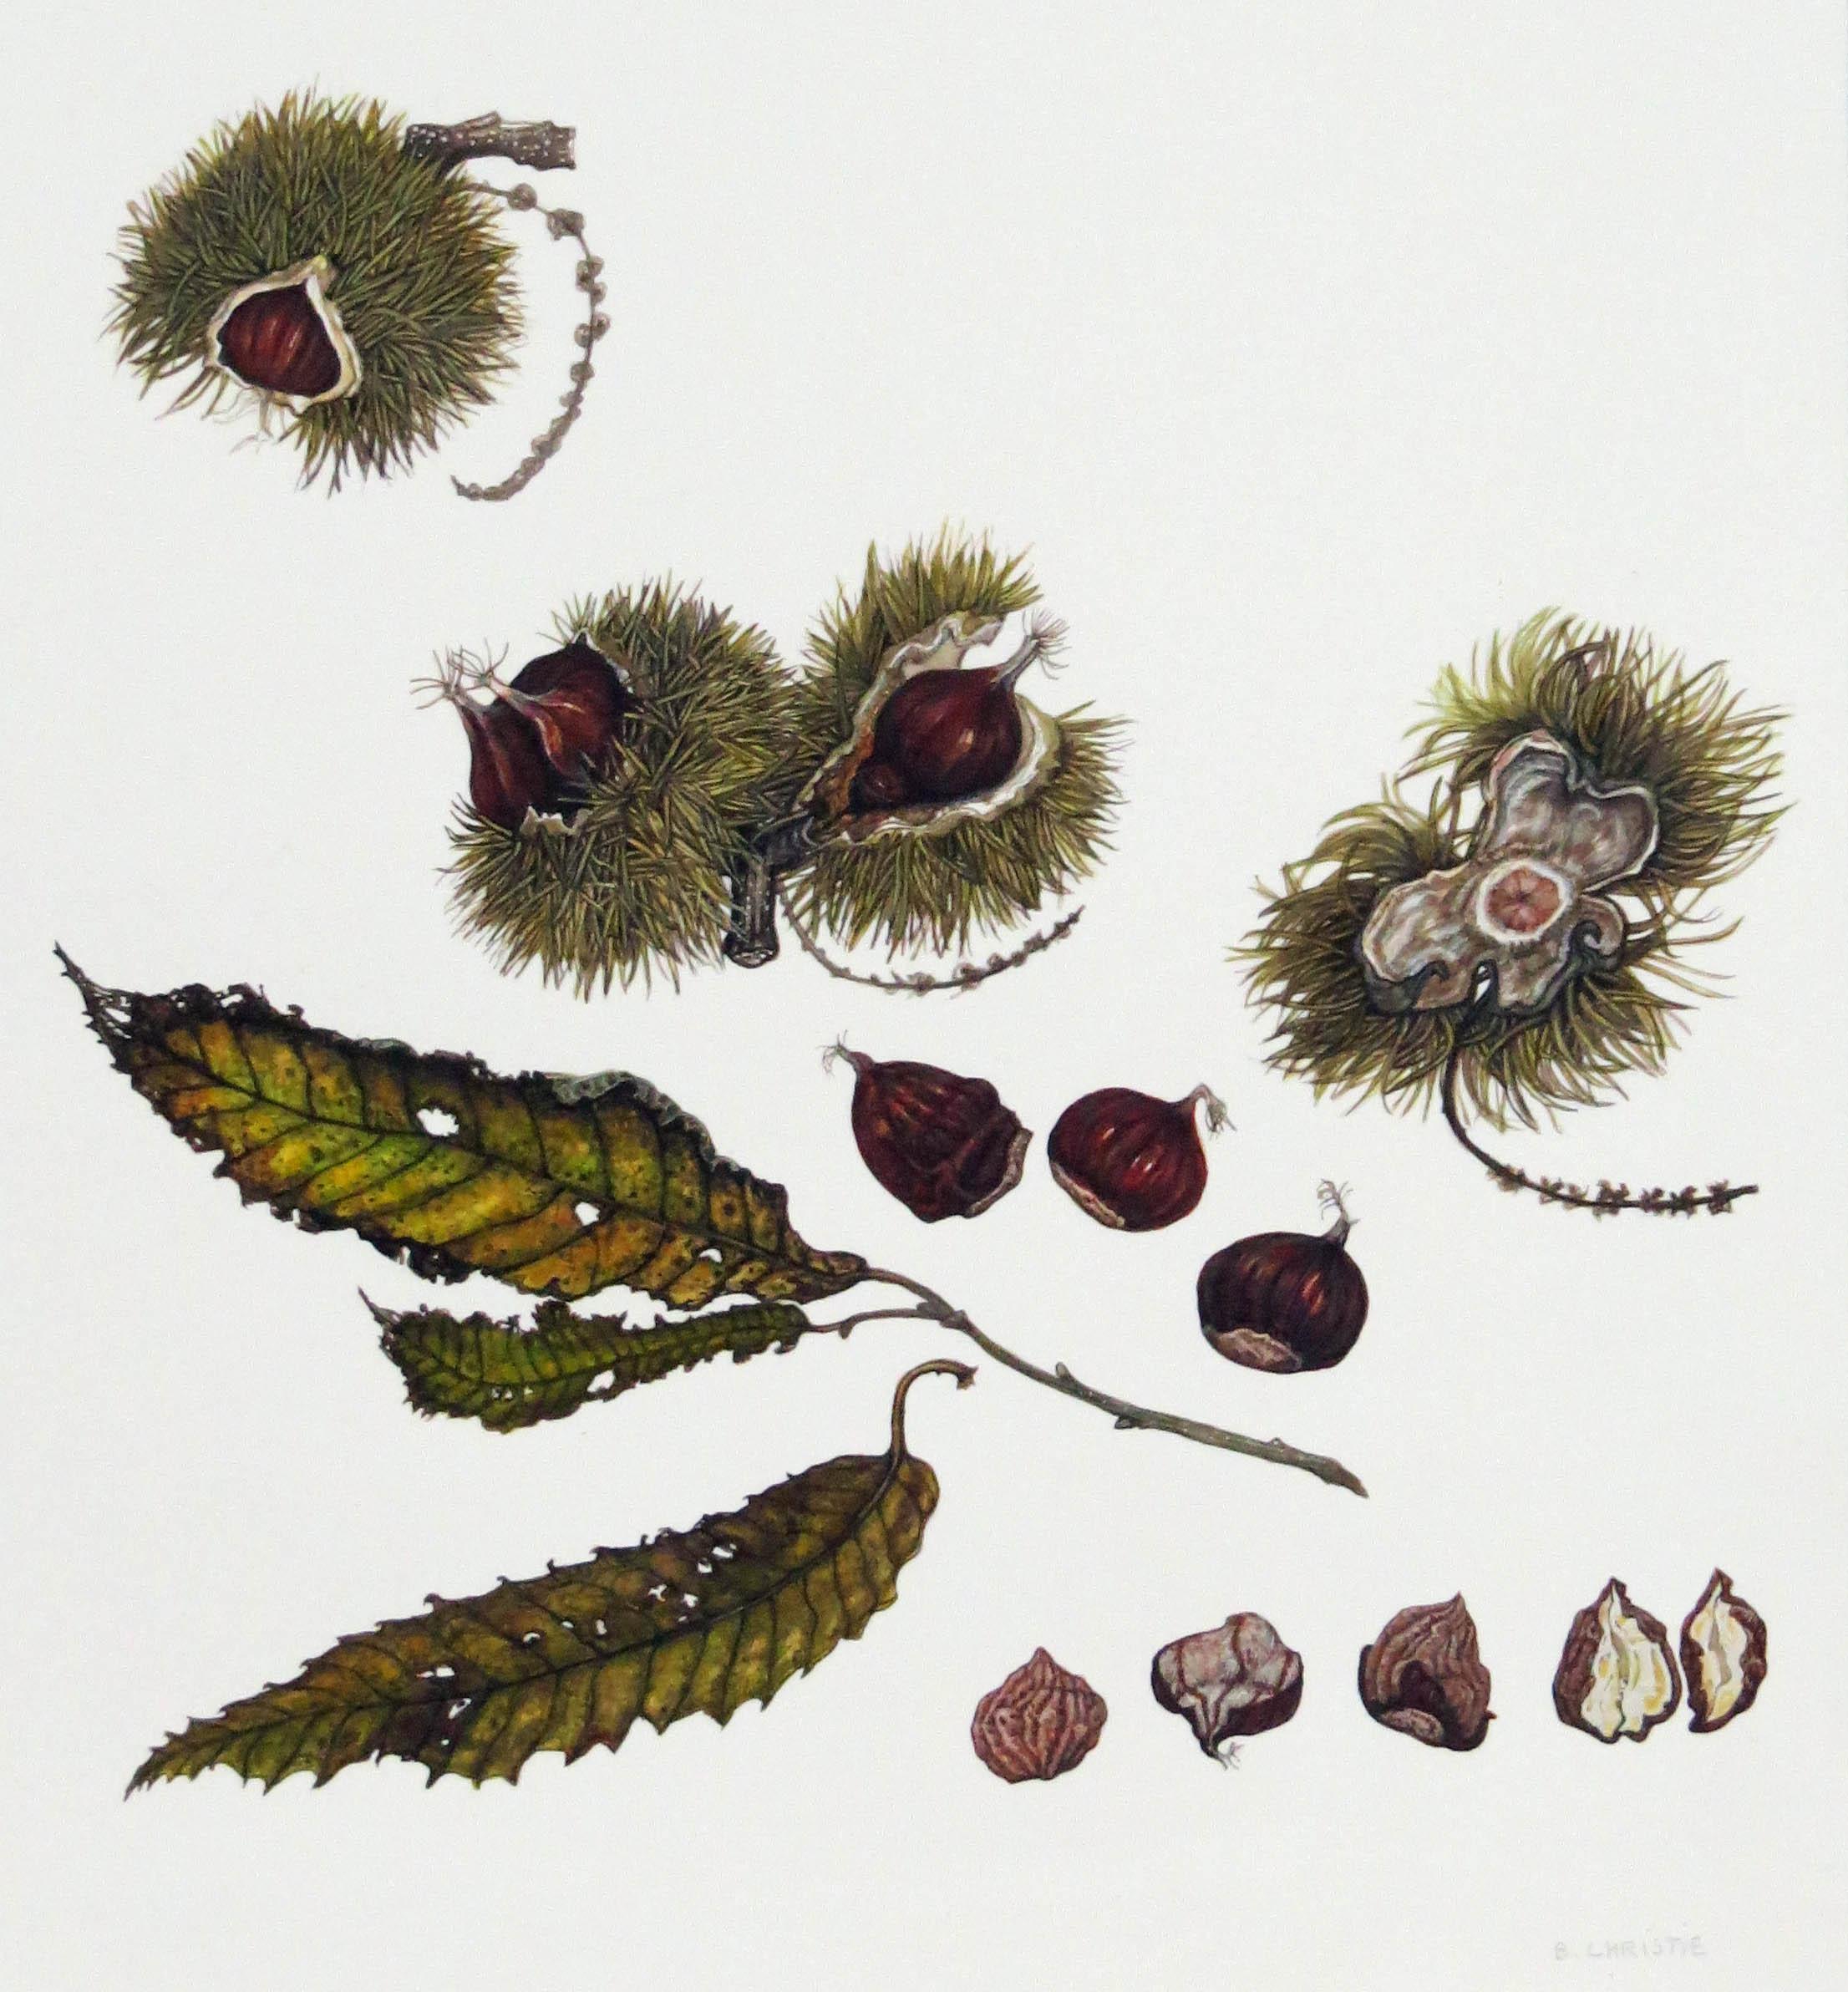 Sweet Chestnut - Castanea Sativa by Betty Christie